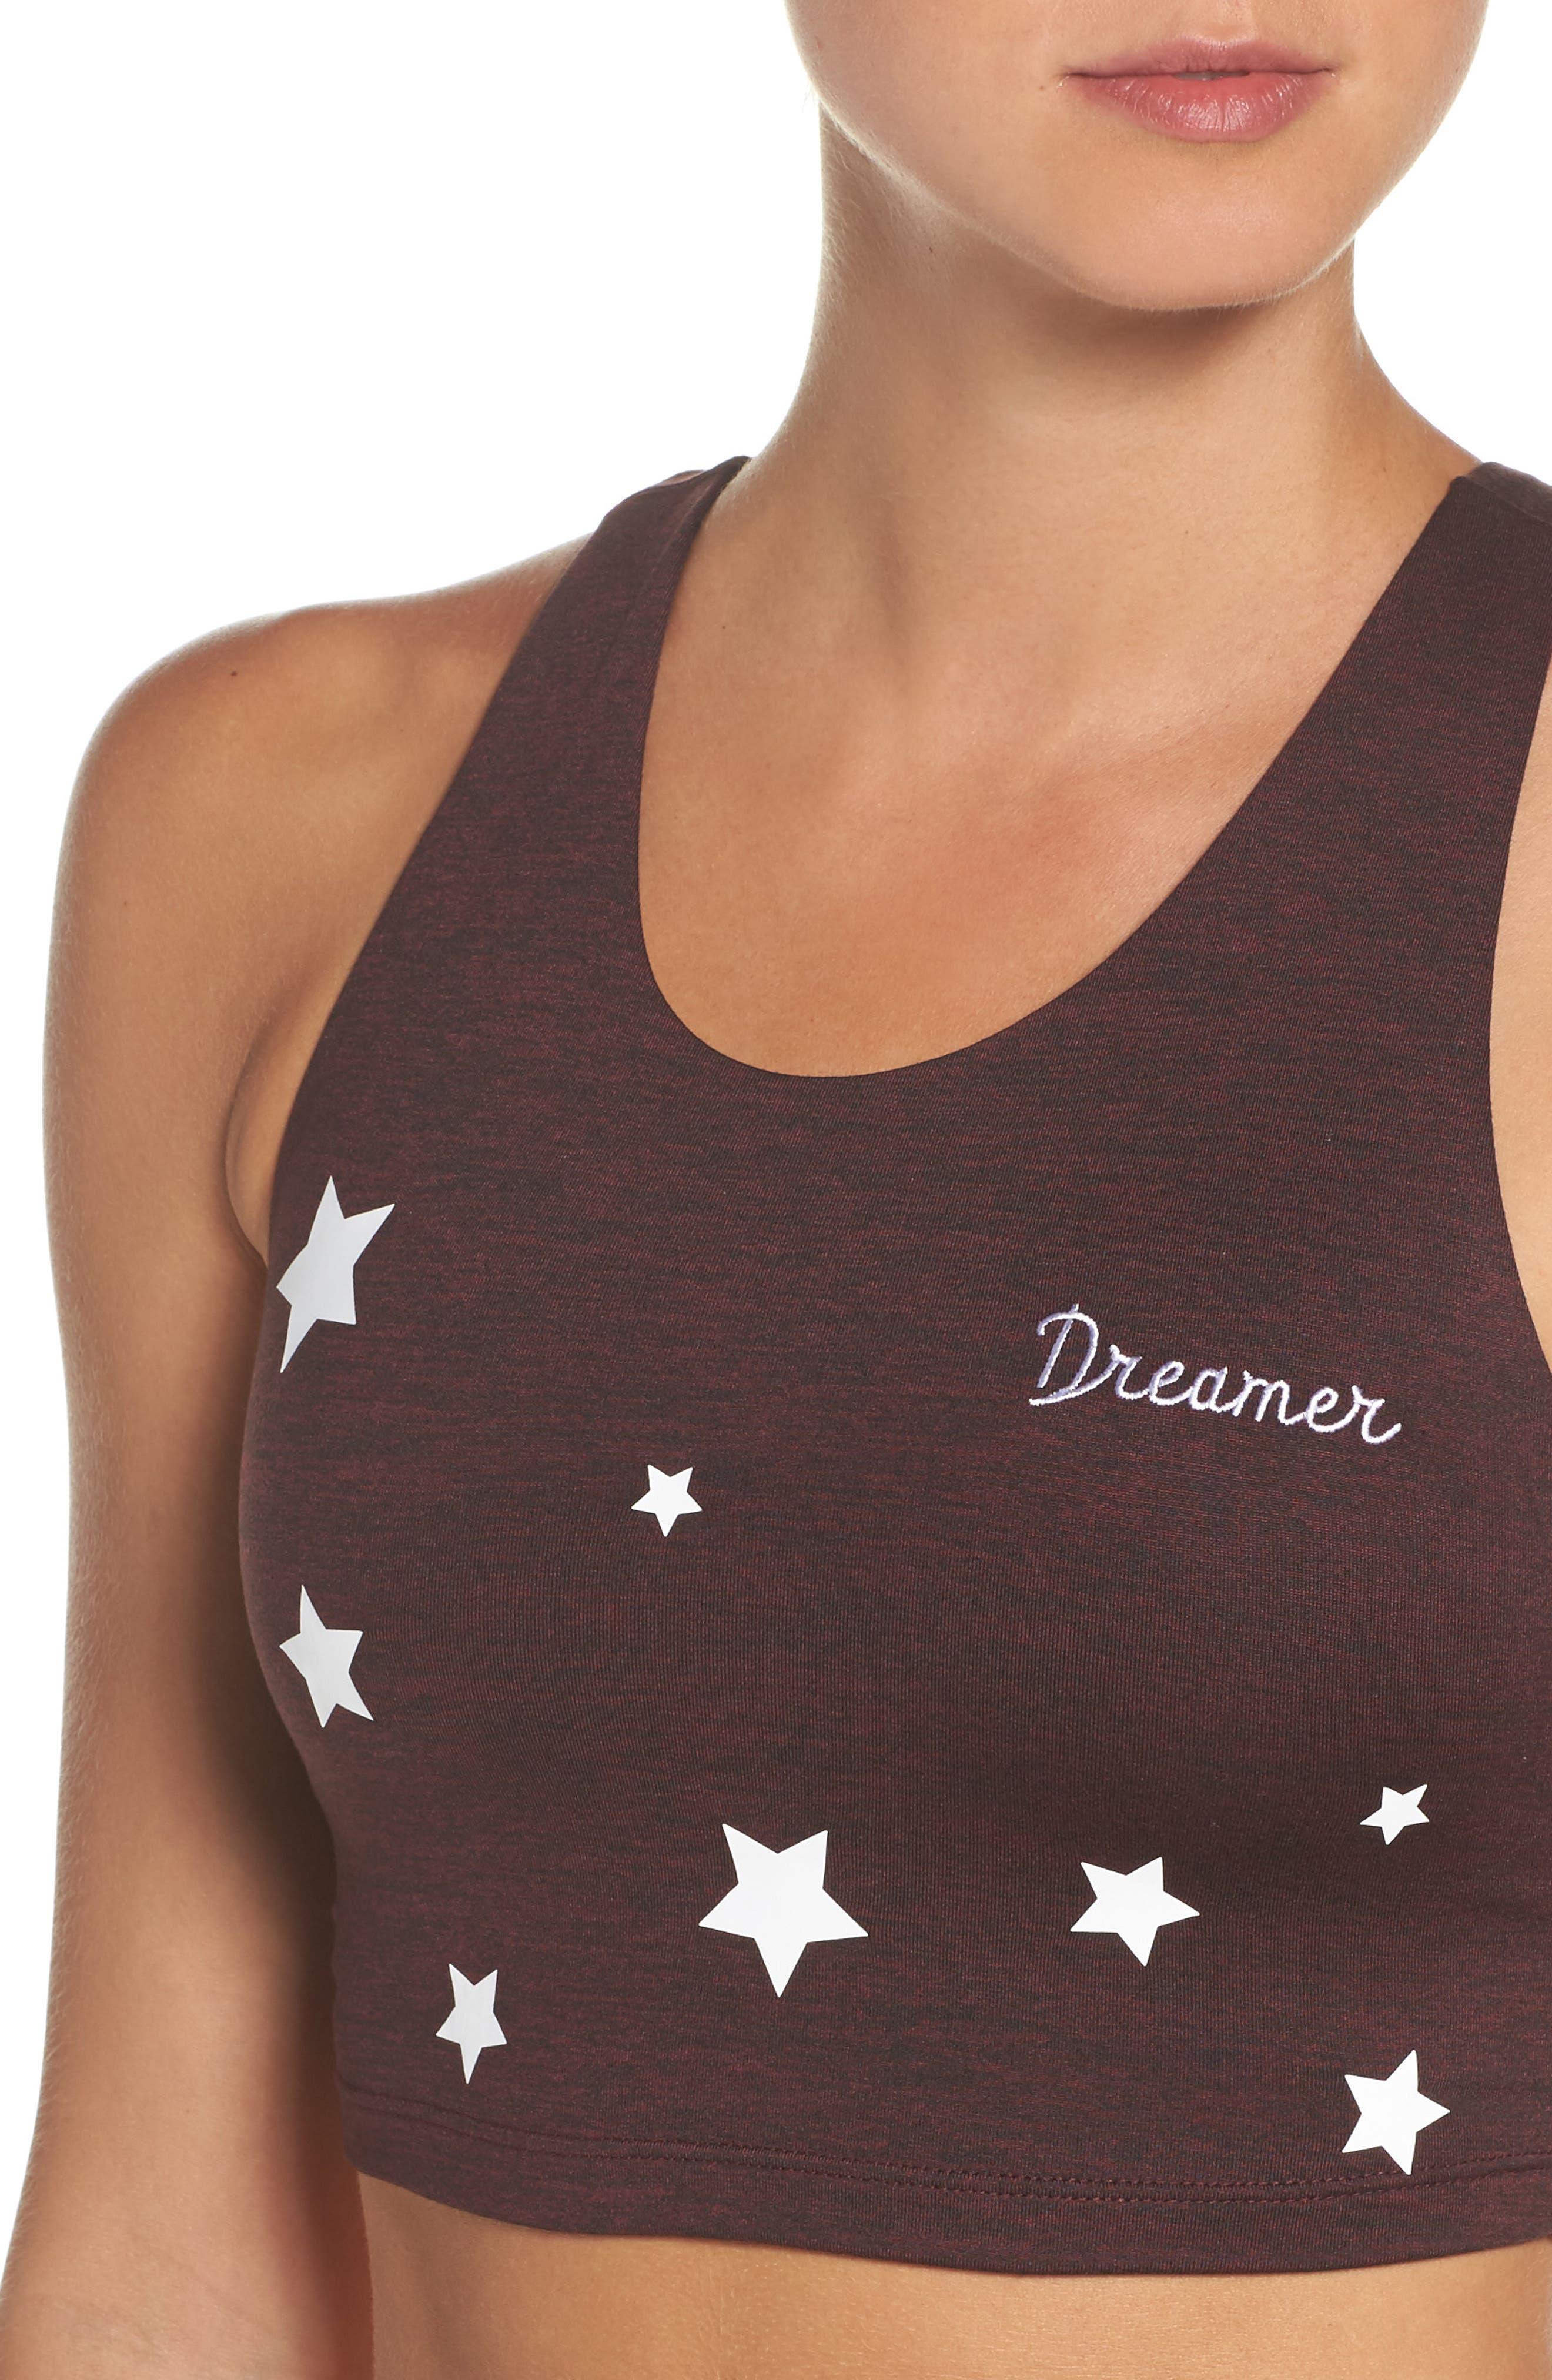 Dreamer Crop Top,                             Alternate thumbnail 4, color,                             Burgundy